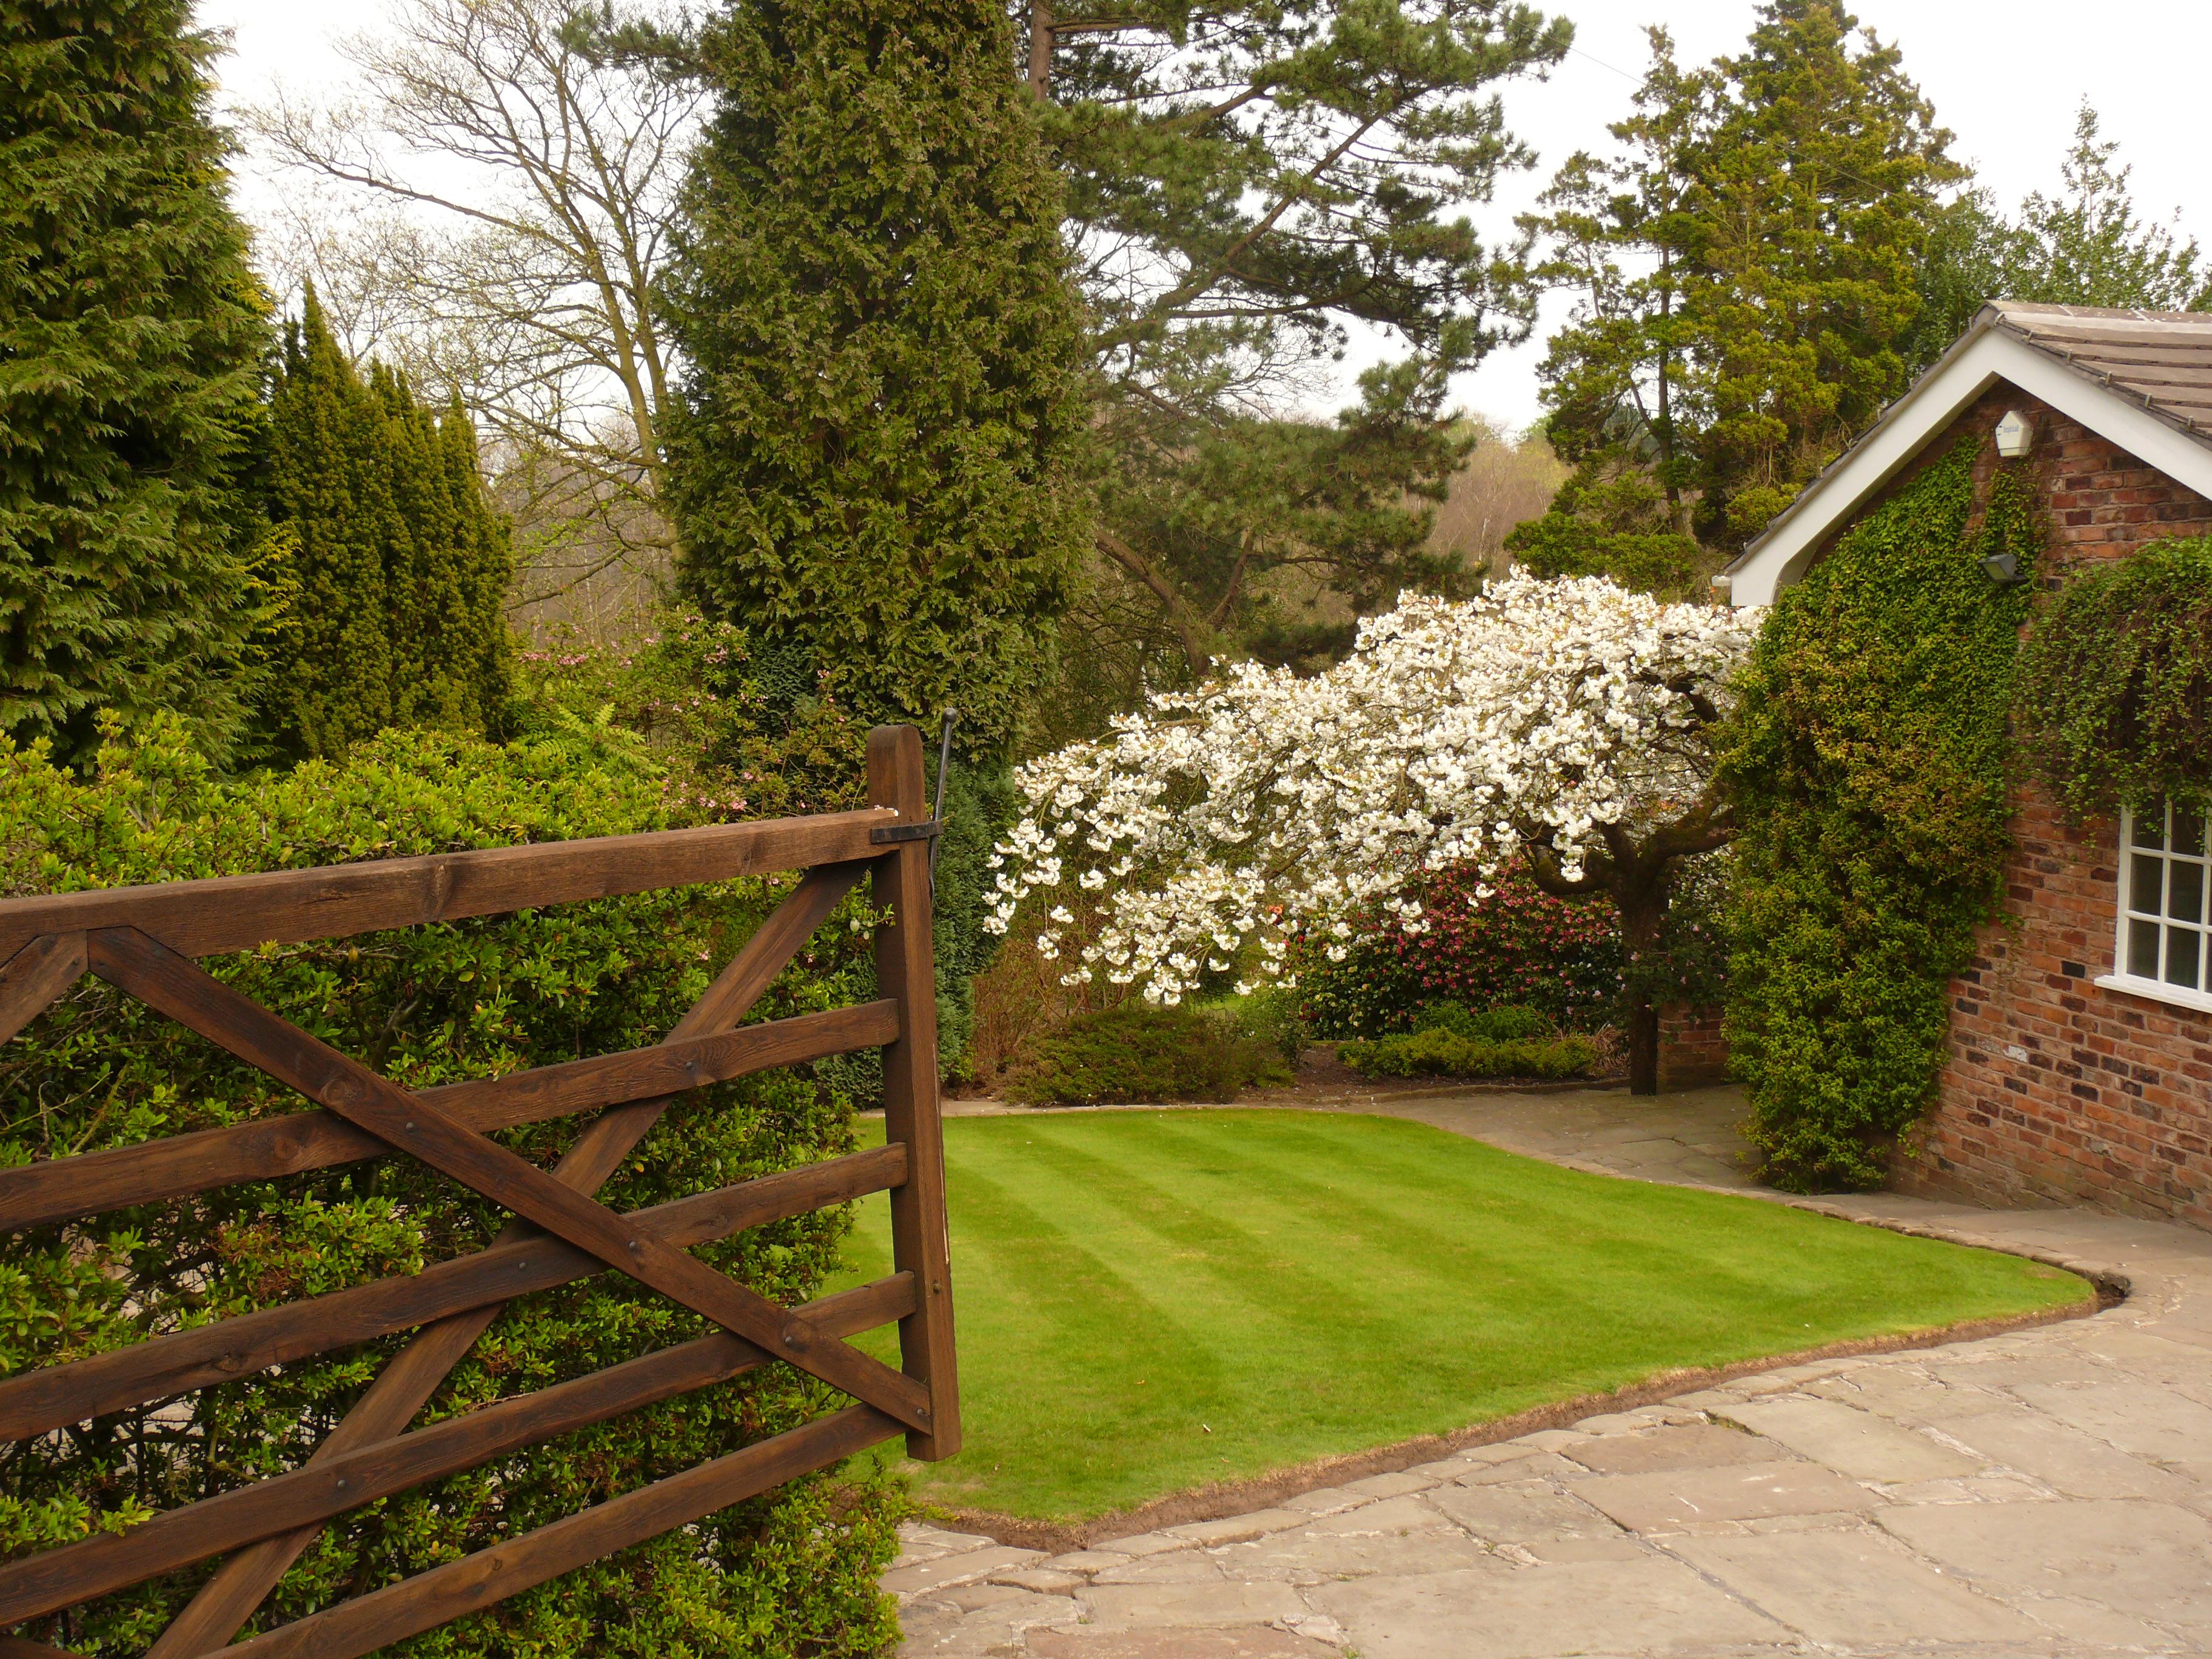 Garden Maintenance Staffordshire and Cheshire